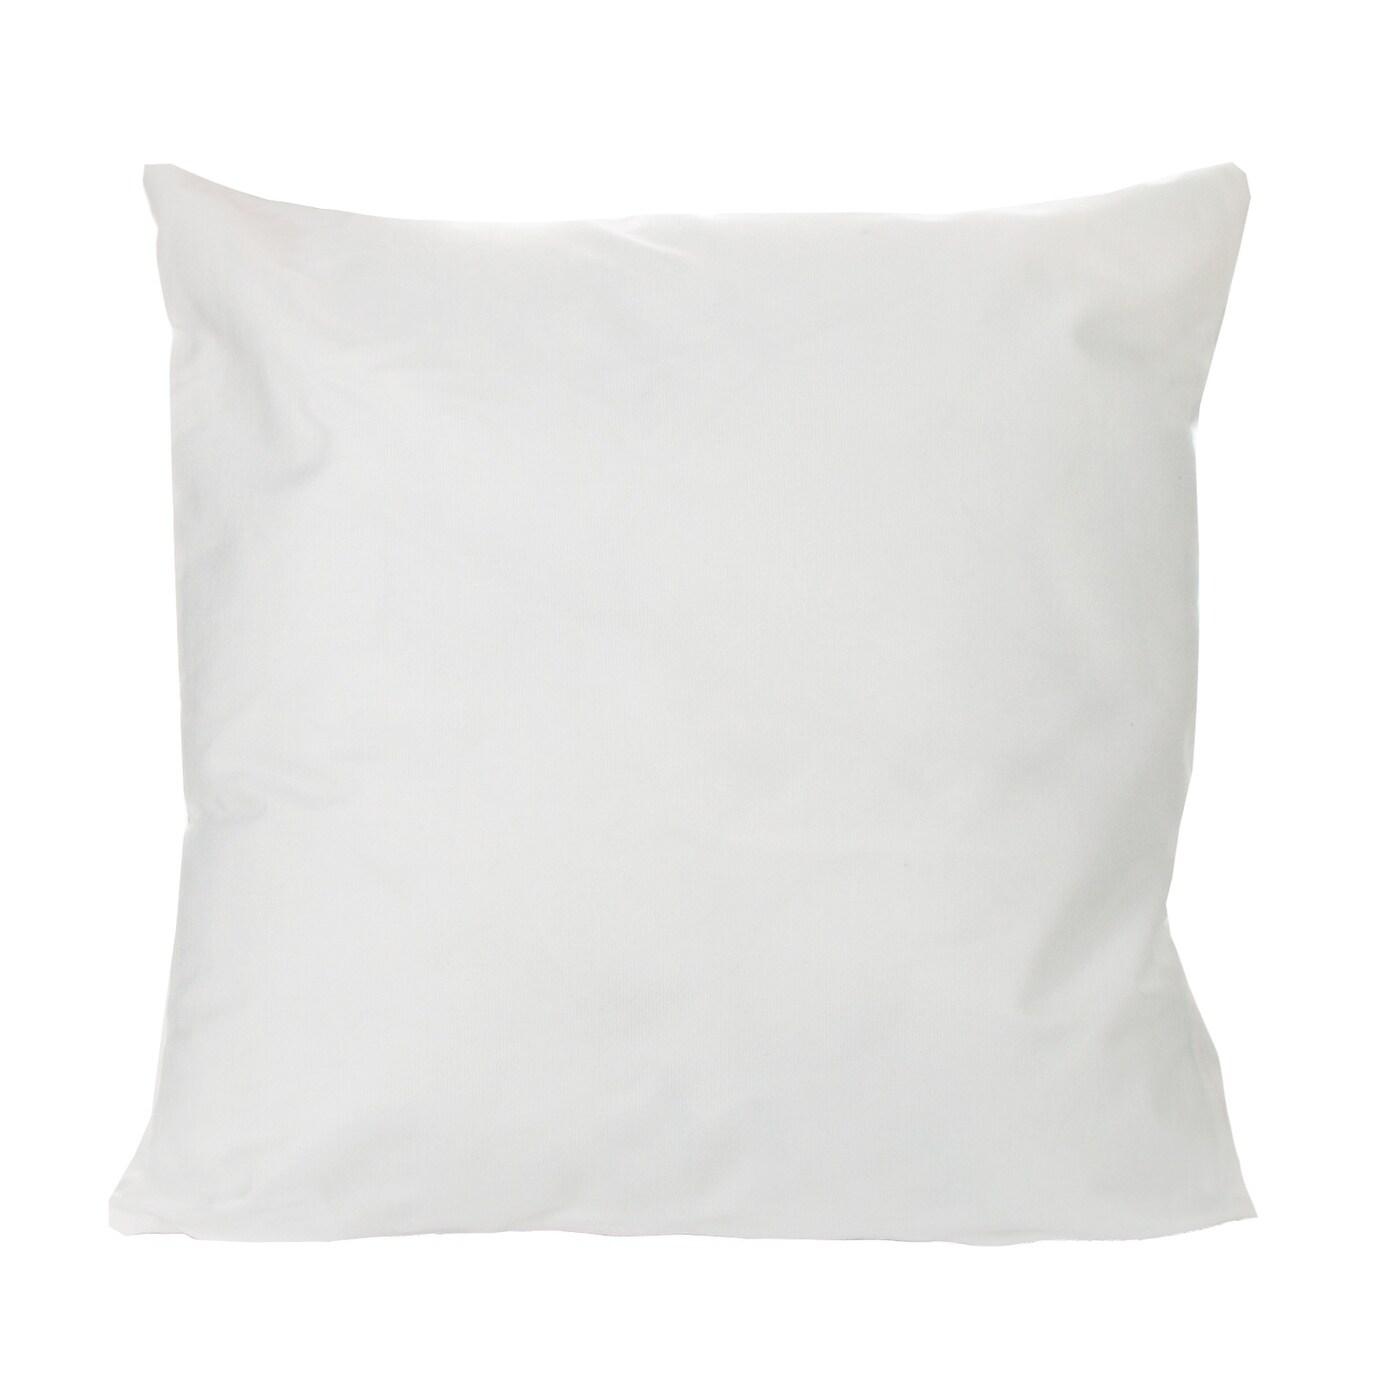 "Rainforest Tucan Flamingo 17"" Microfiber Throw Pillow Cover - Free ..."